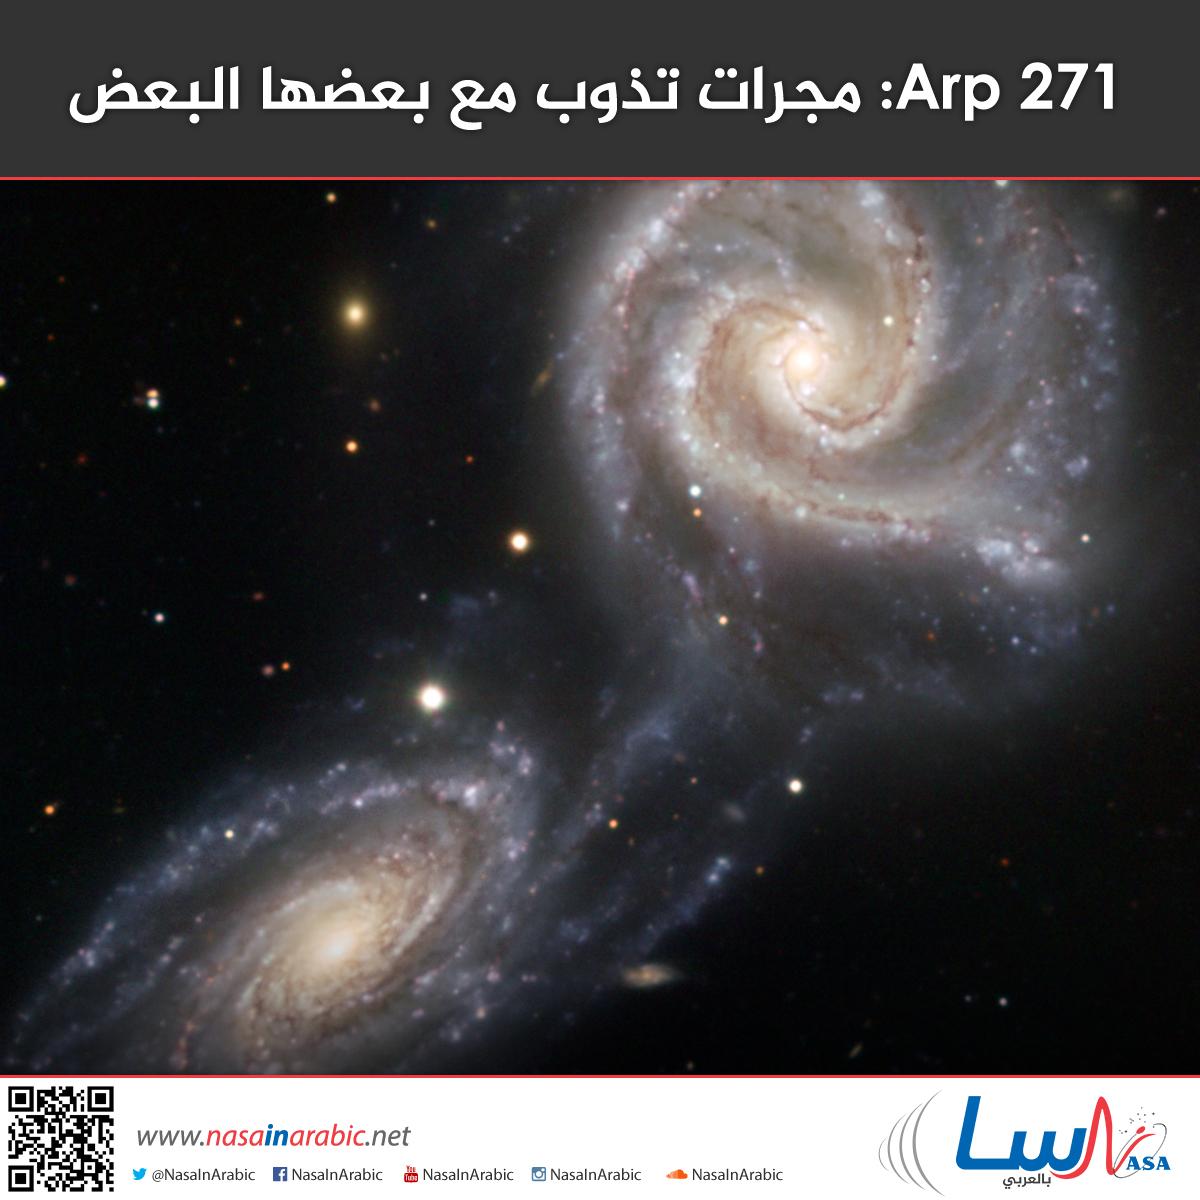 Arp 271: مجرات تذوب مع بعضها البعض